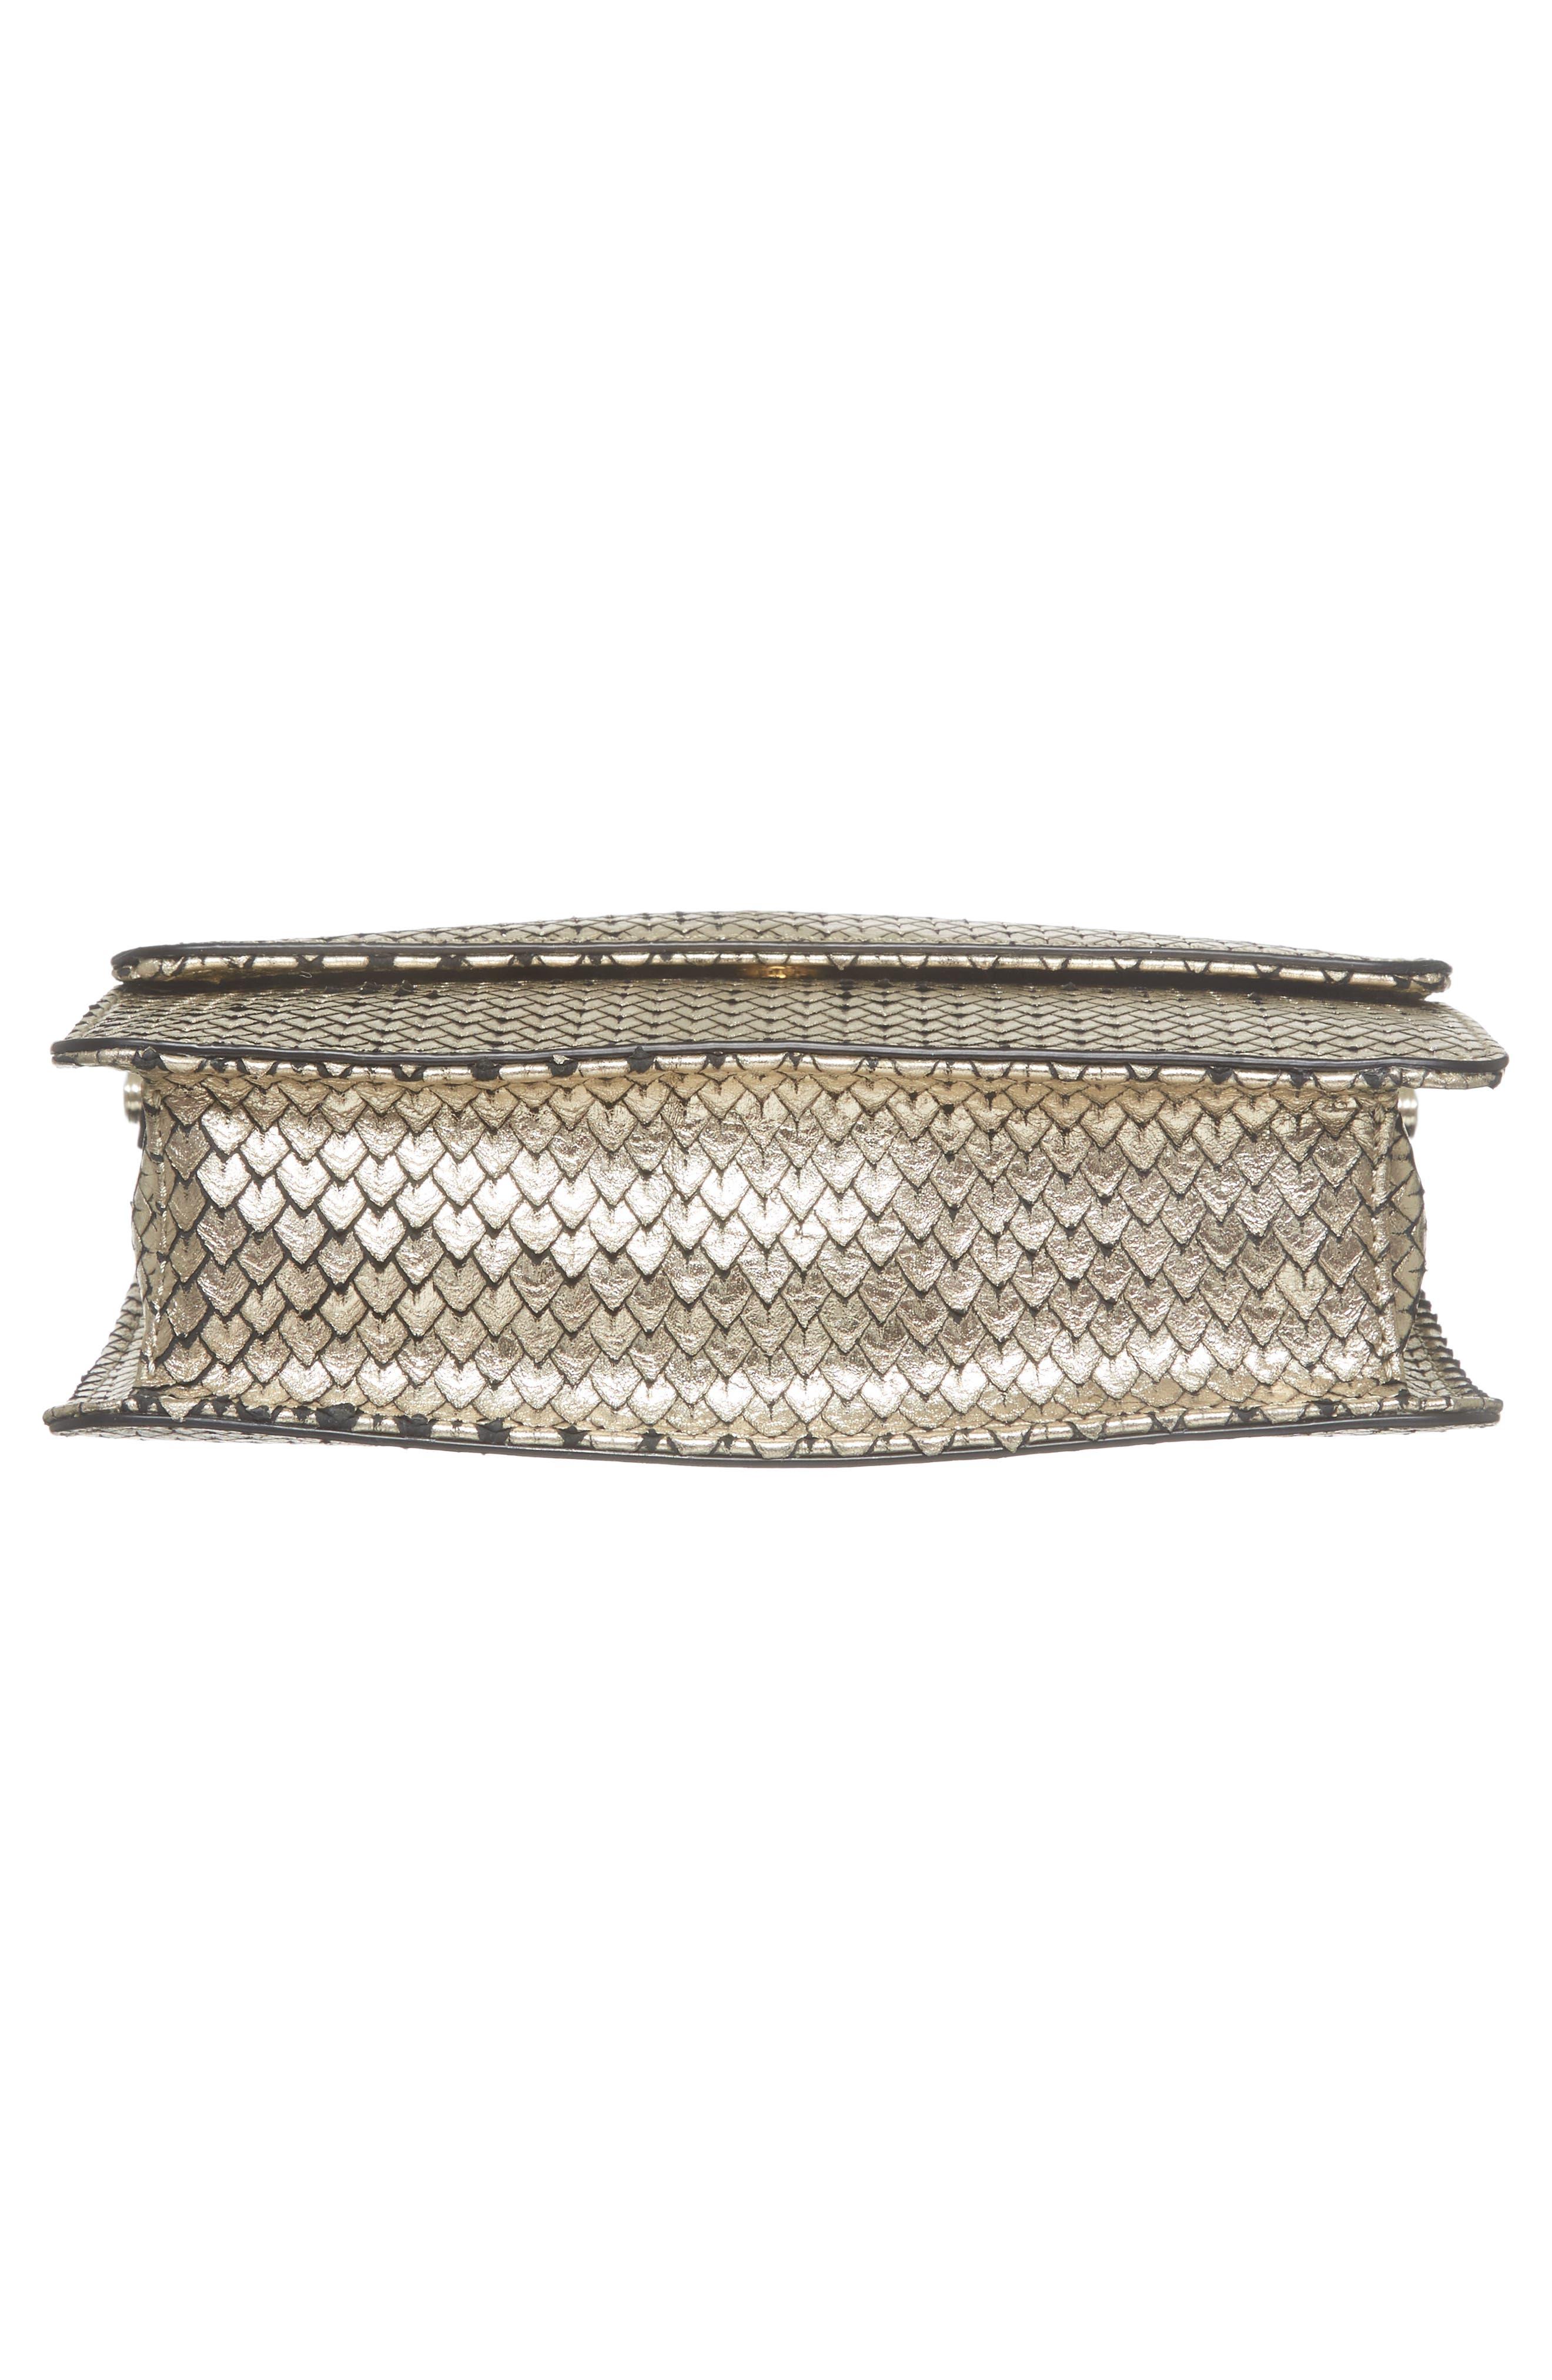 Crawford Calfskin Leather Crossbody Bag,                             Alternate thumbnail 18, color,